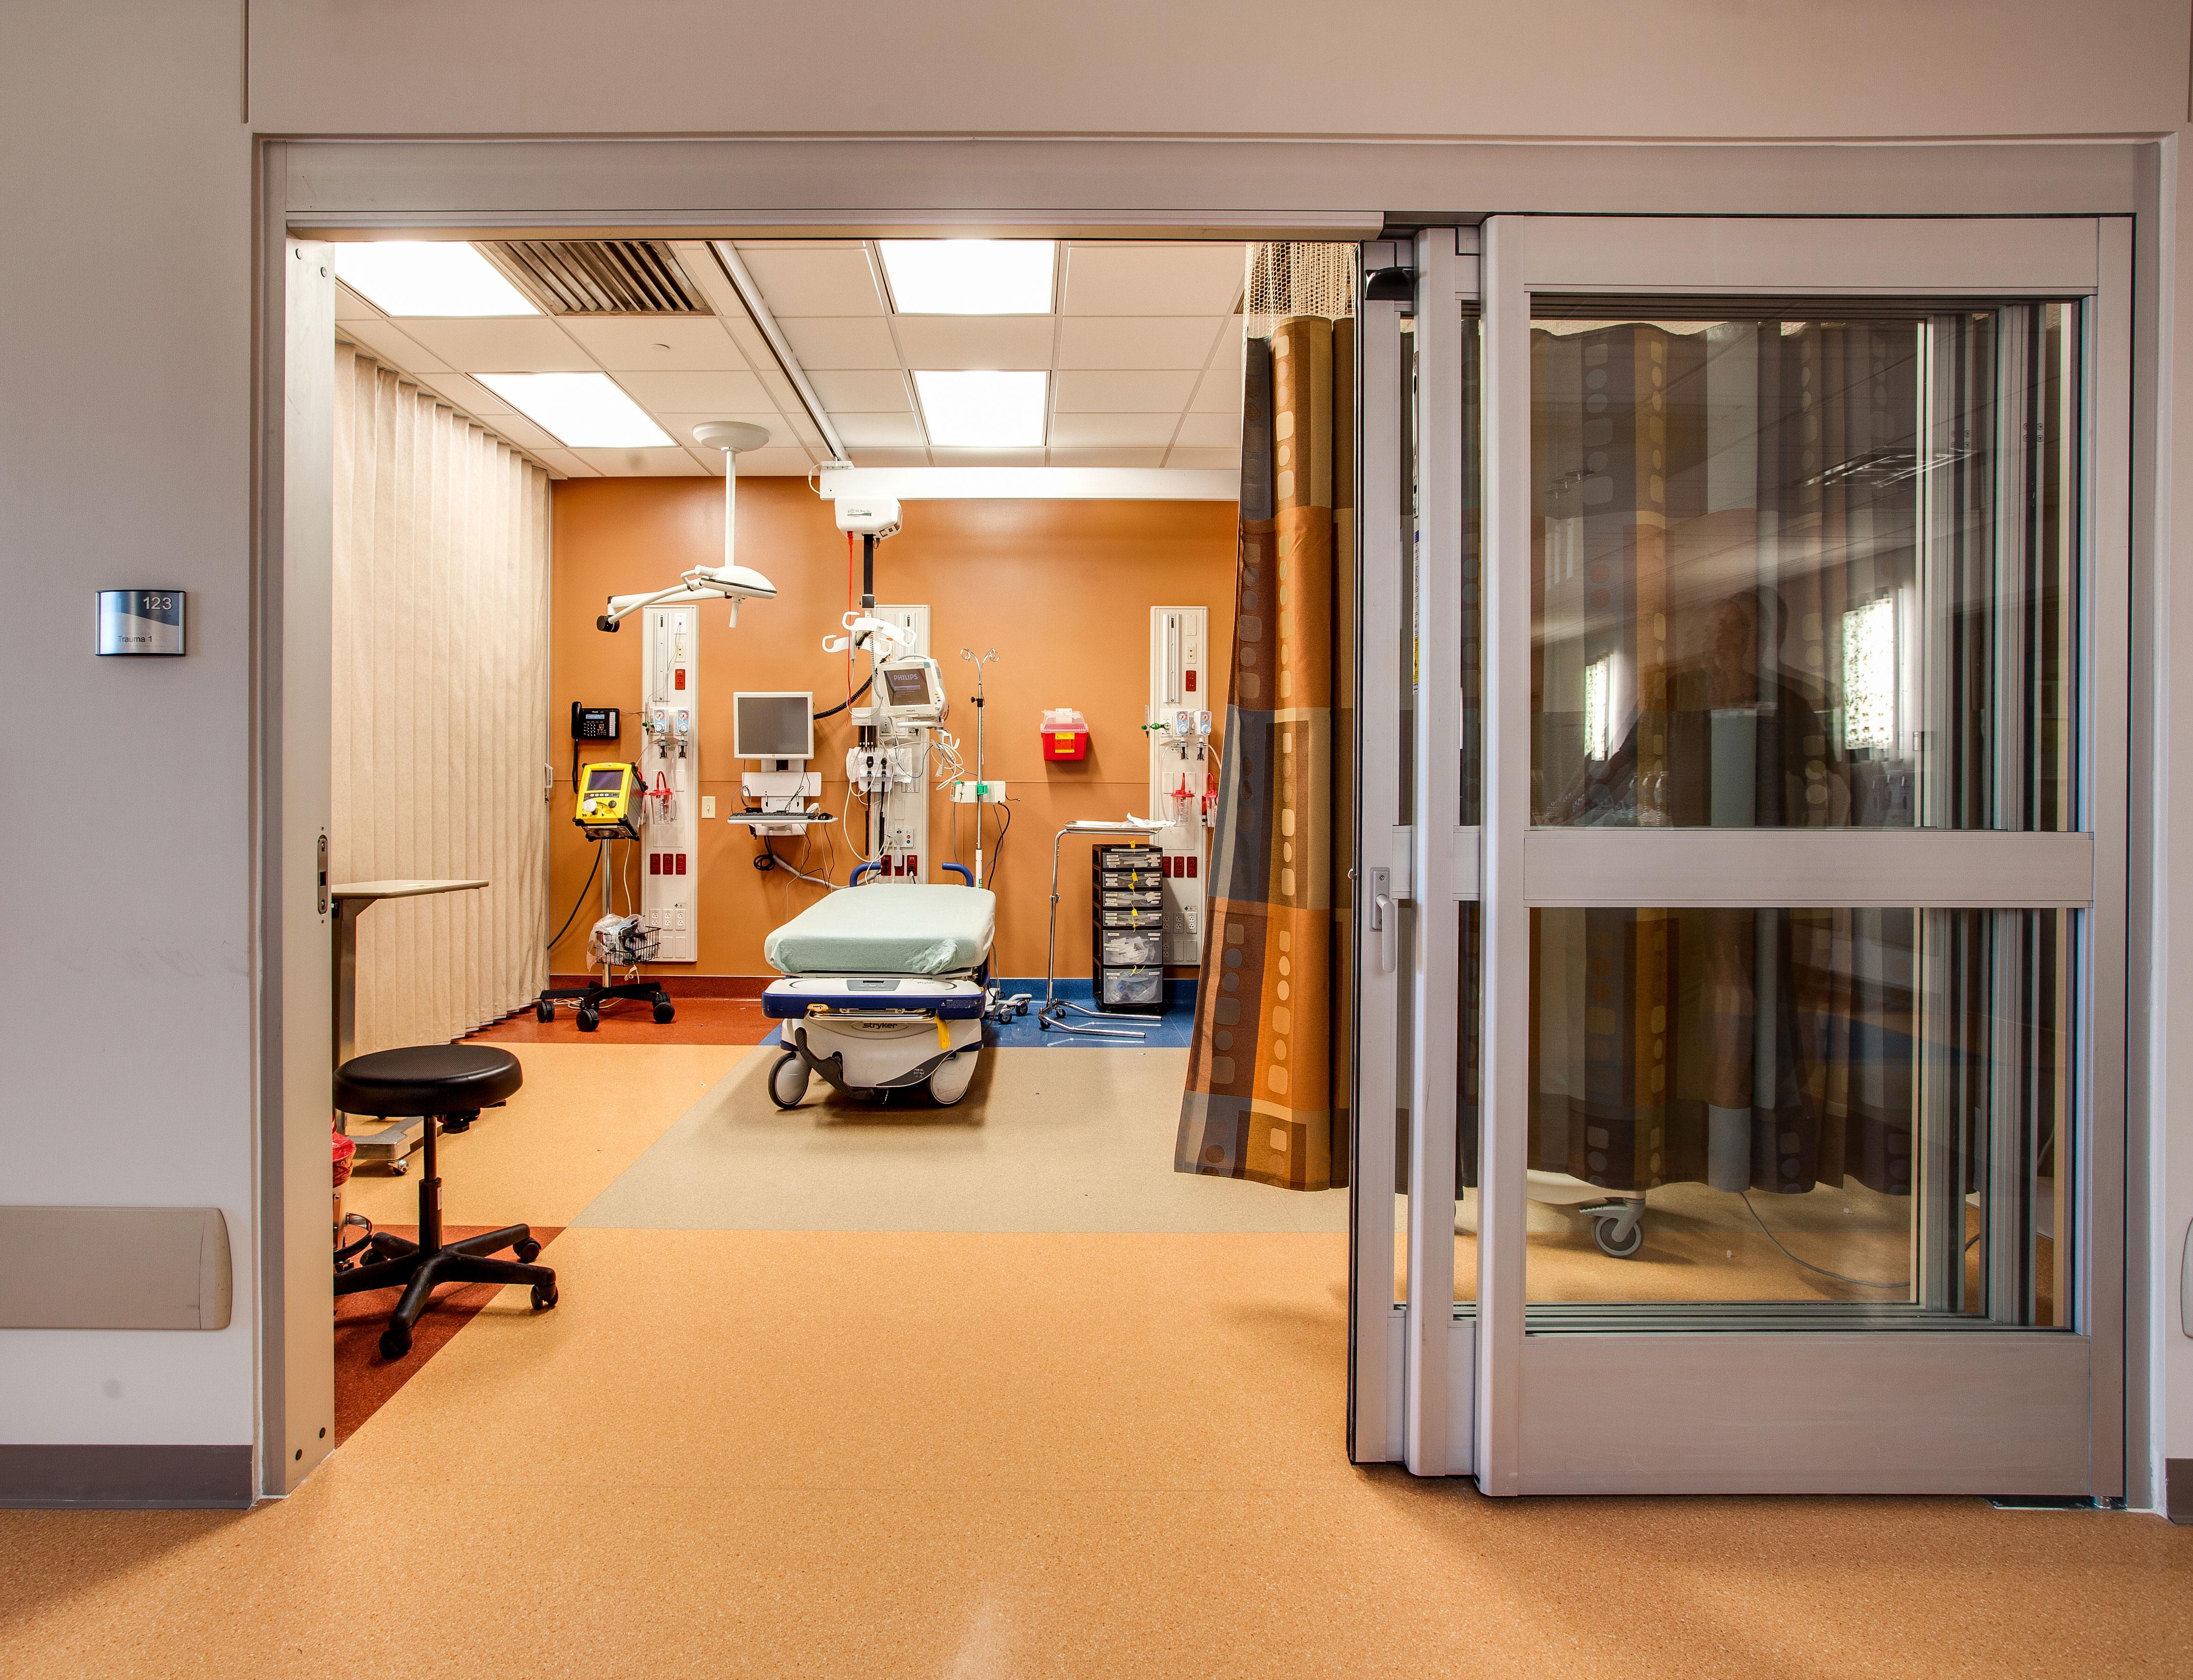 sierra vista hospital emergency department